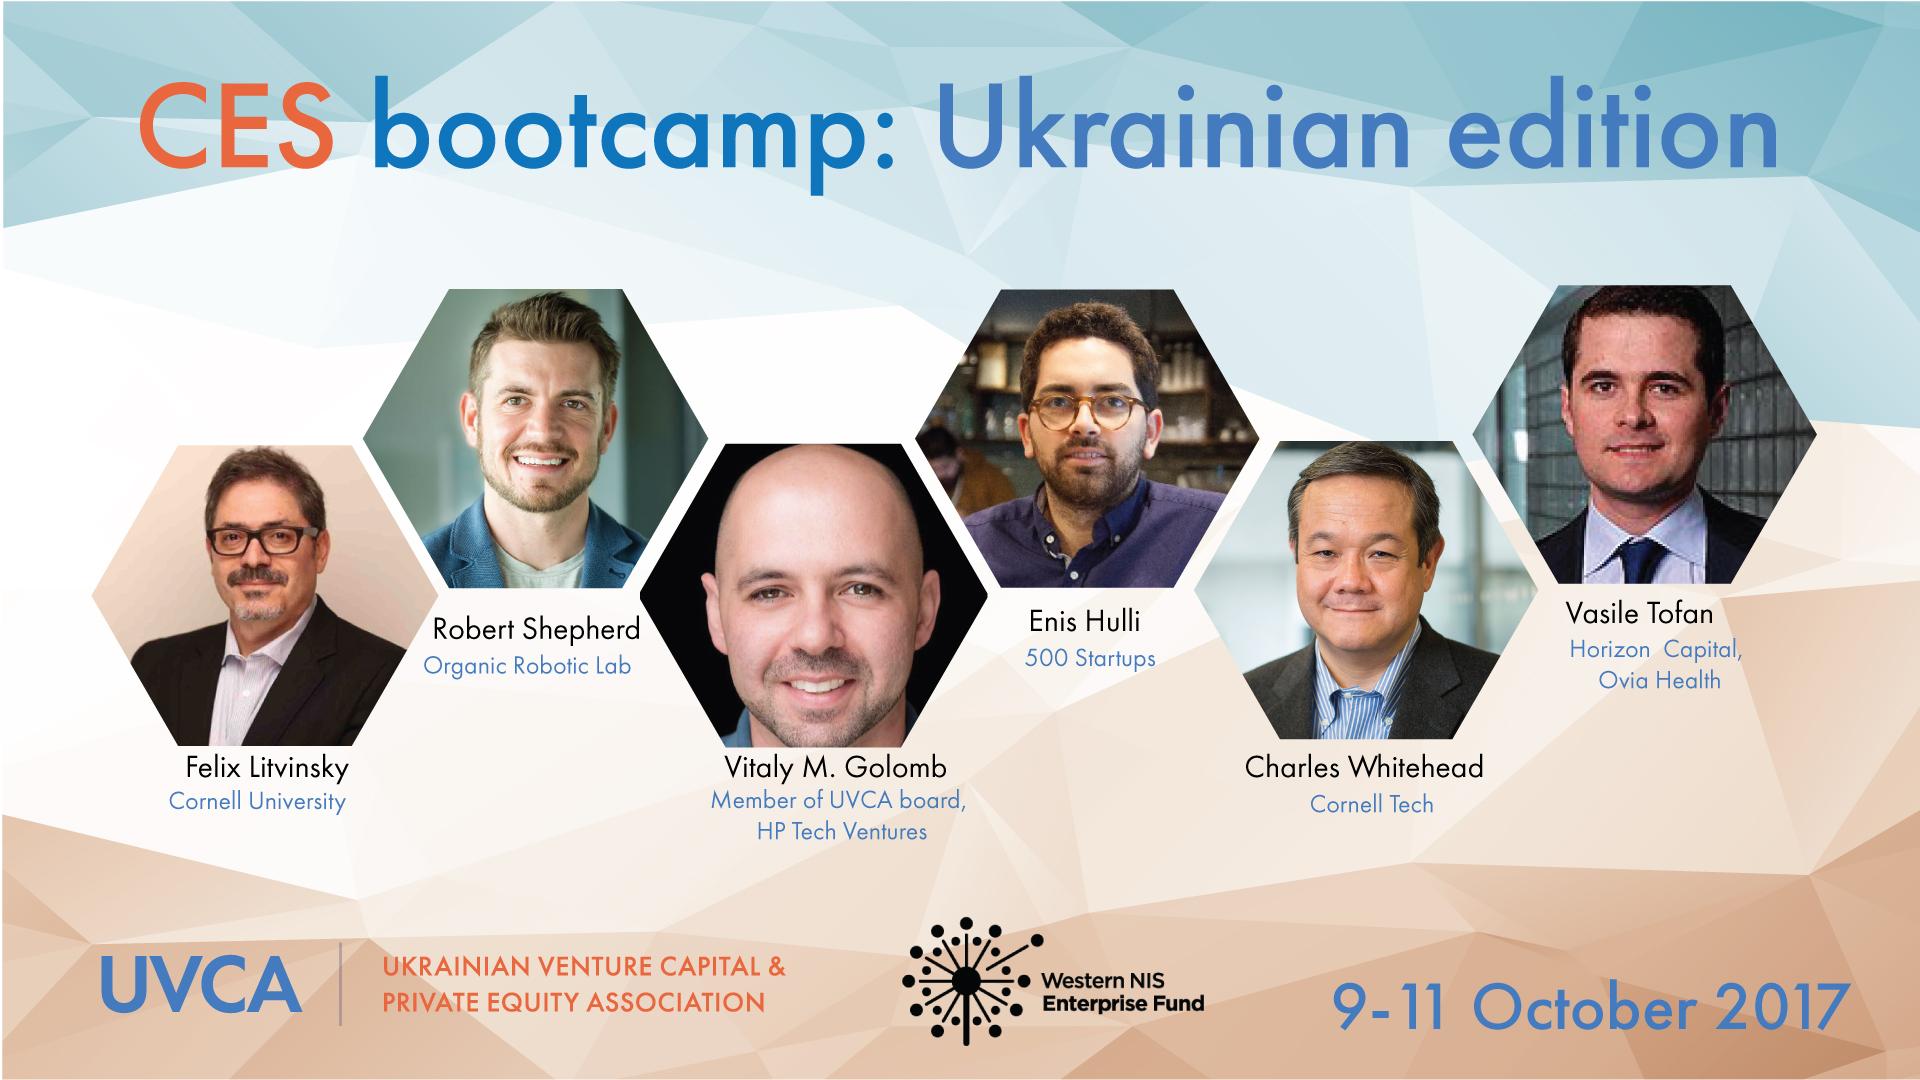 CES bootcamp: Ukrainian edition